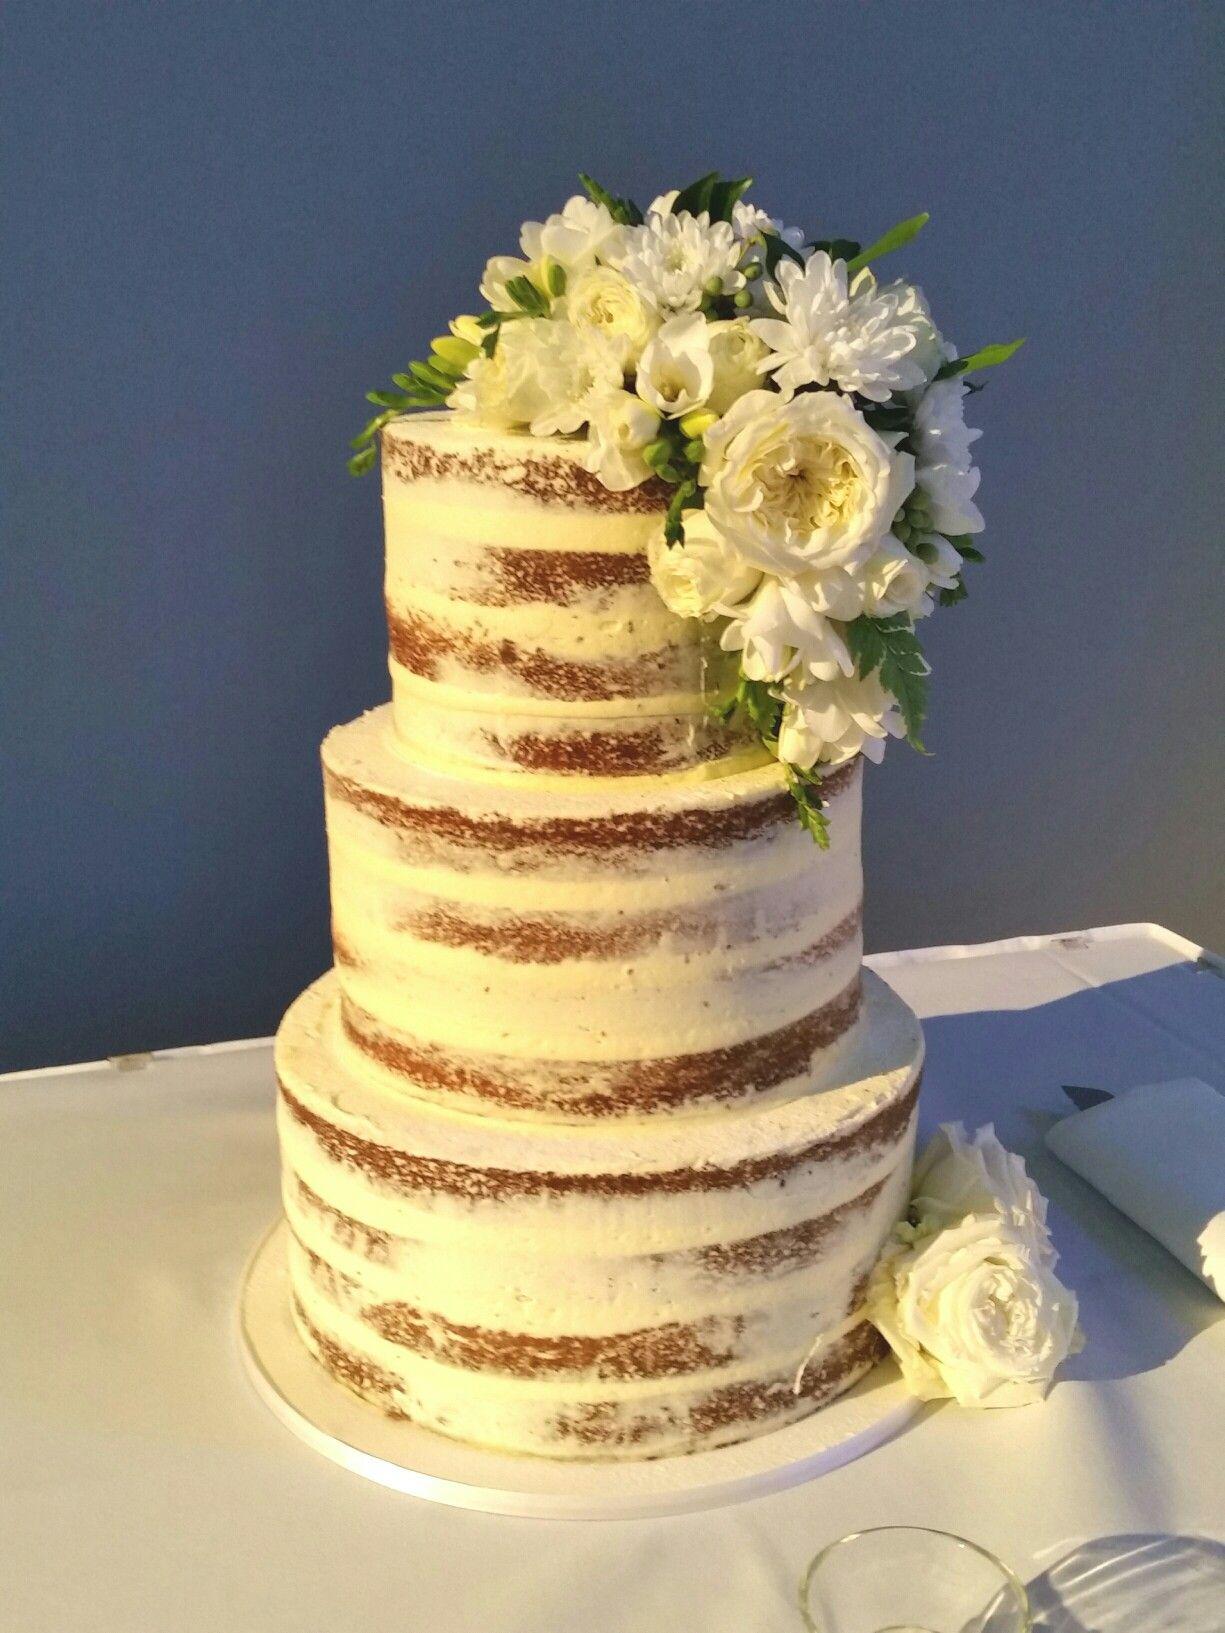 Nude Wedding Cake by Unreal Wedding Cakes | Tortas | Pinterest ...